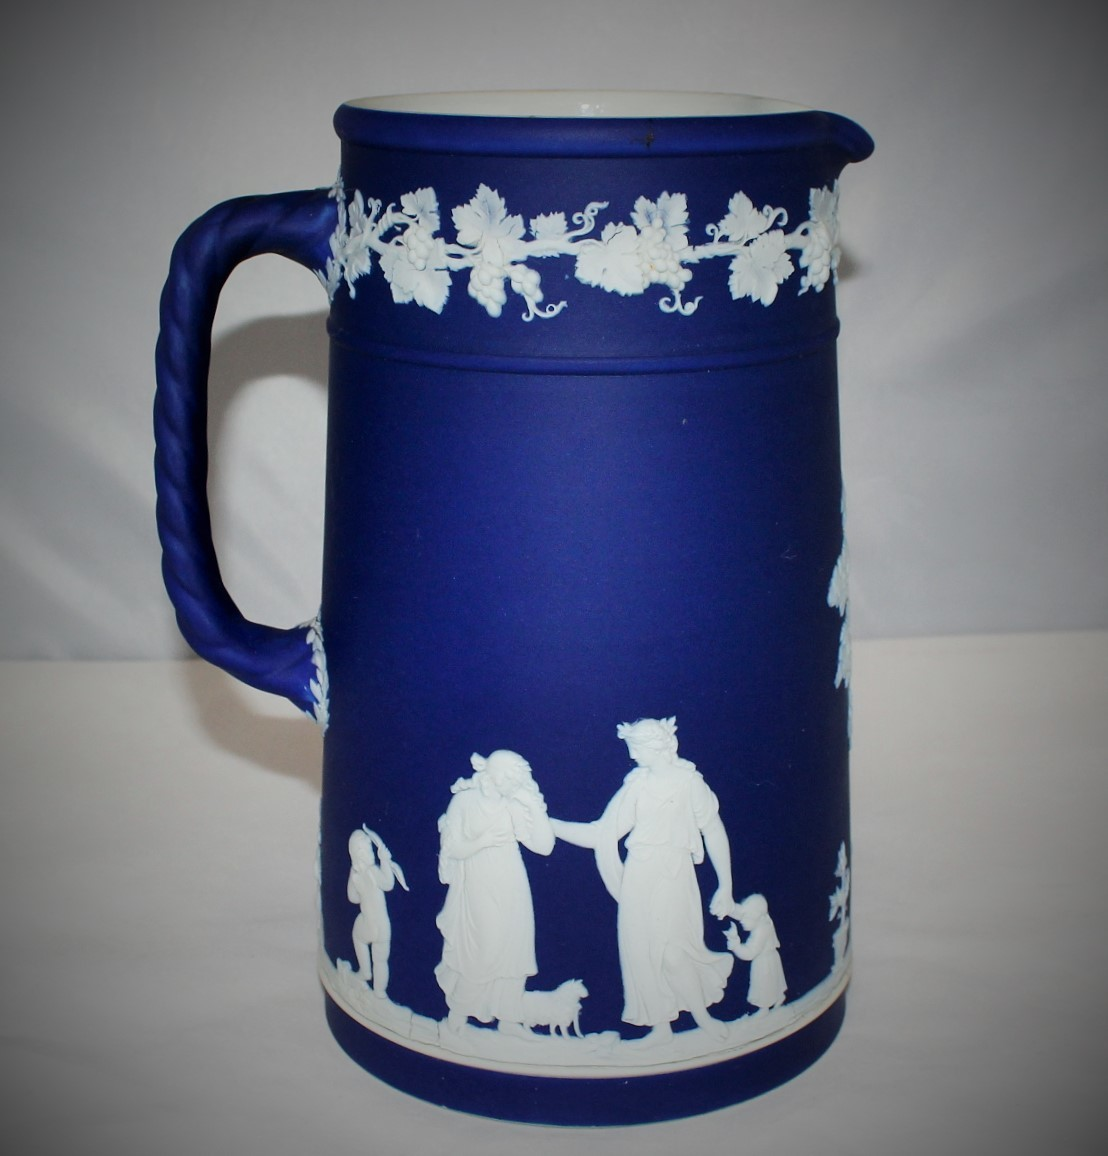 "Antique Wedgwood Jasperware Large 8.5"" Cobalt Blue NeoClassical Pitcher, England"